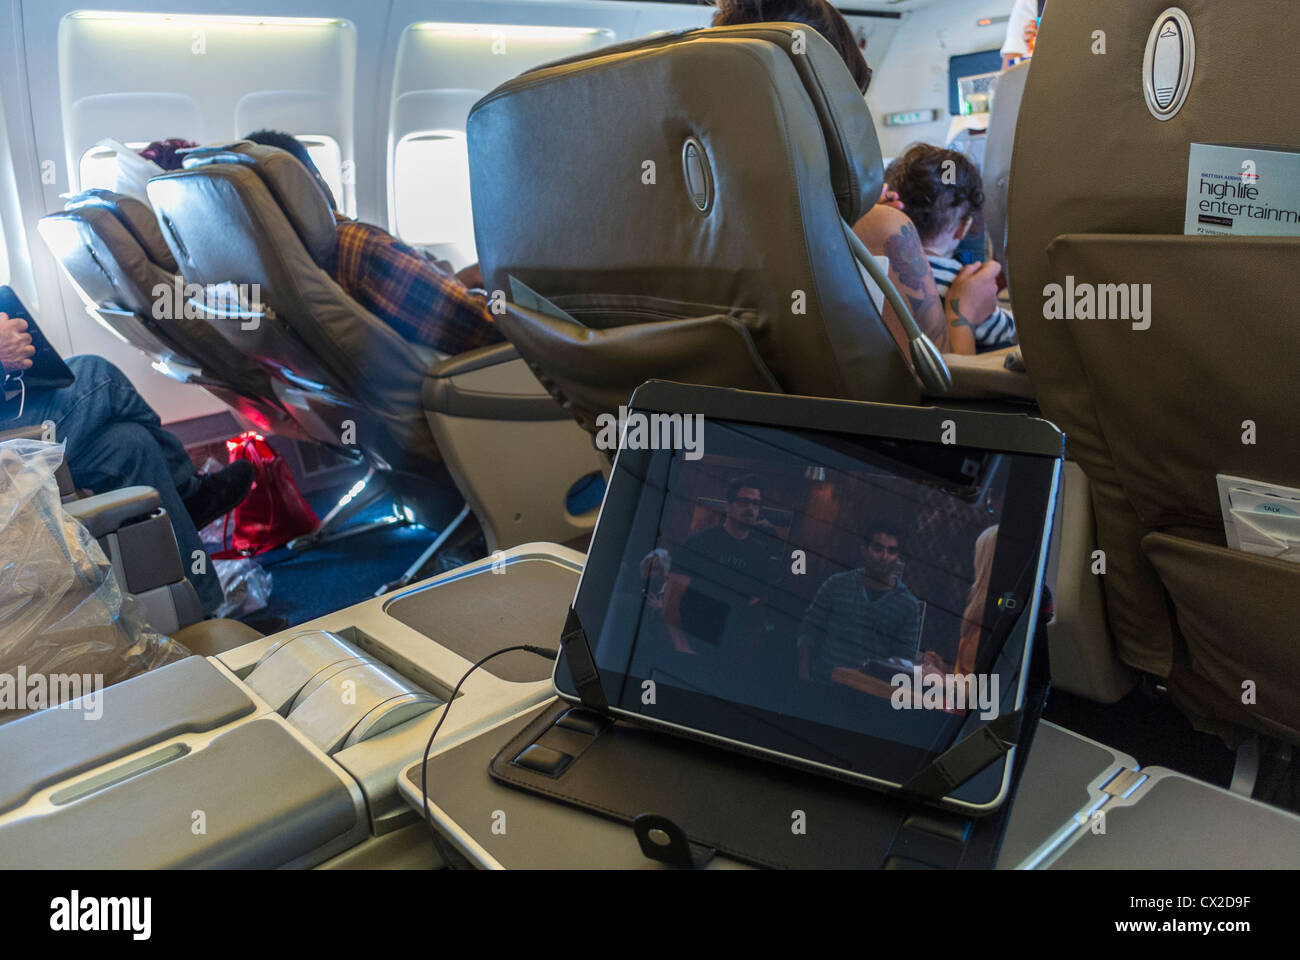 plane seats stockfotos plane seats bilder seite 20 alamy. Black Bedroom Furniture Sets. Home Design Ideas